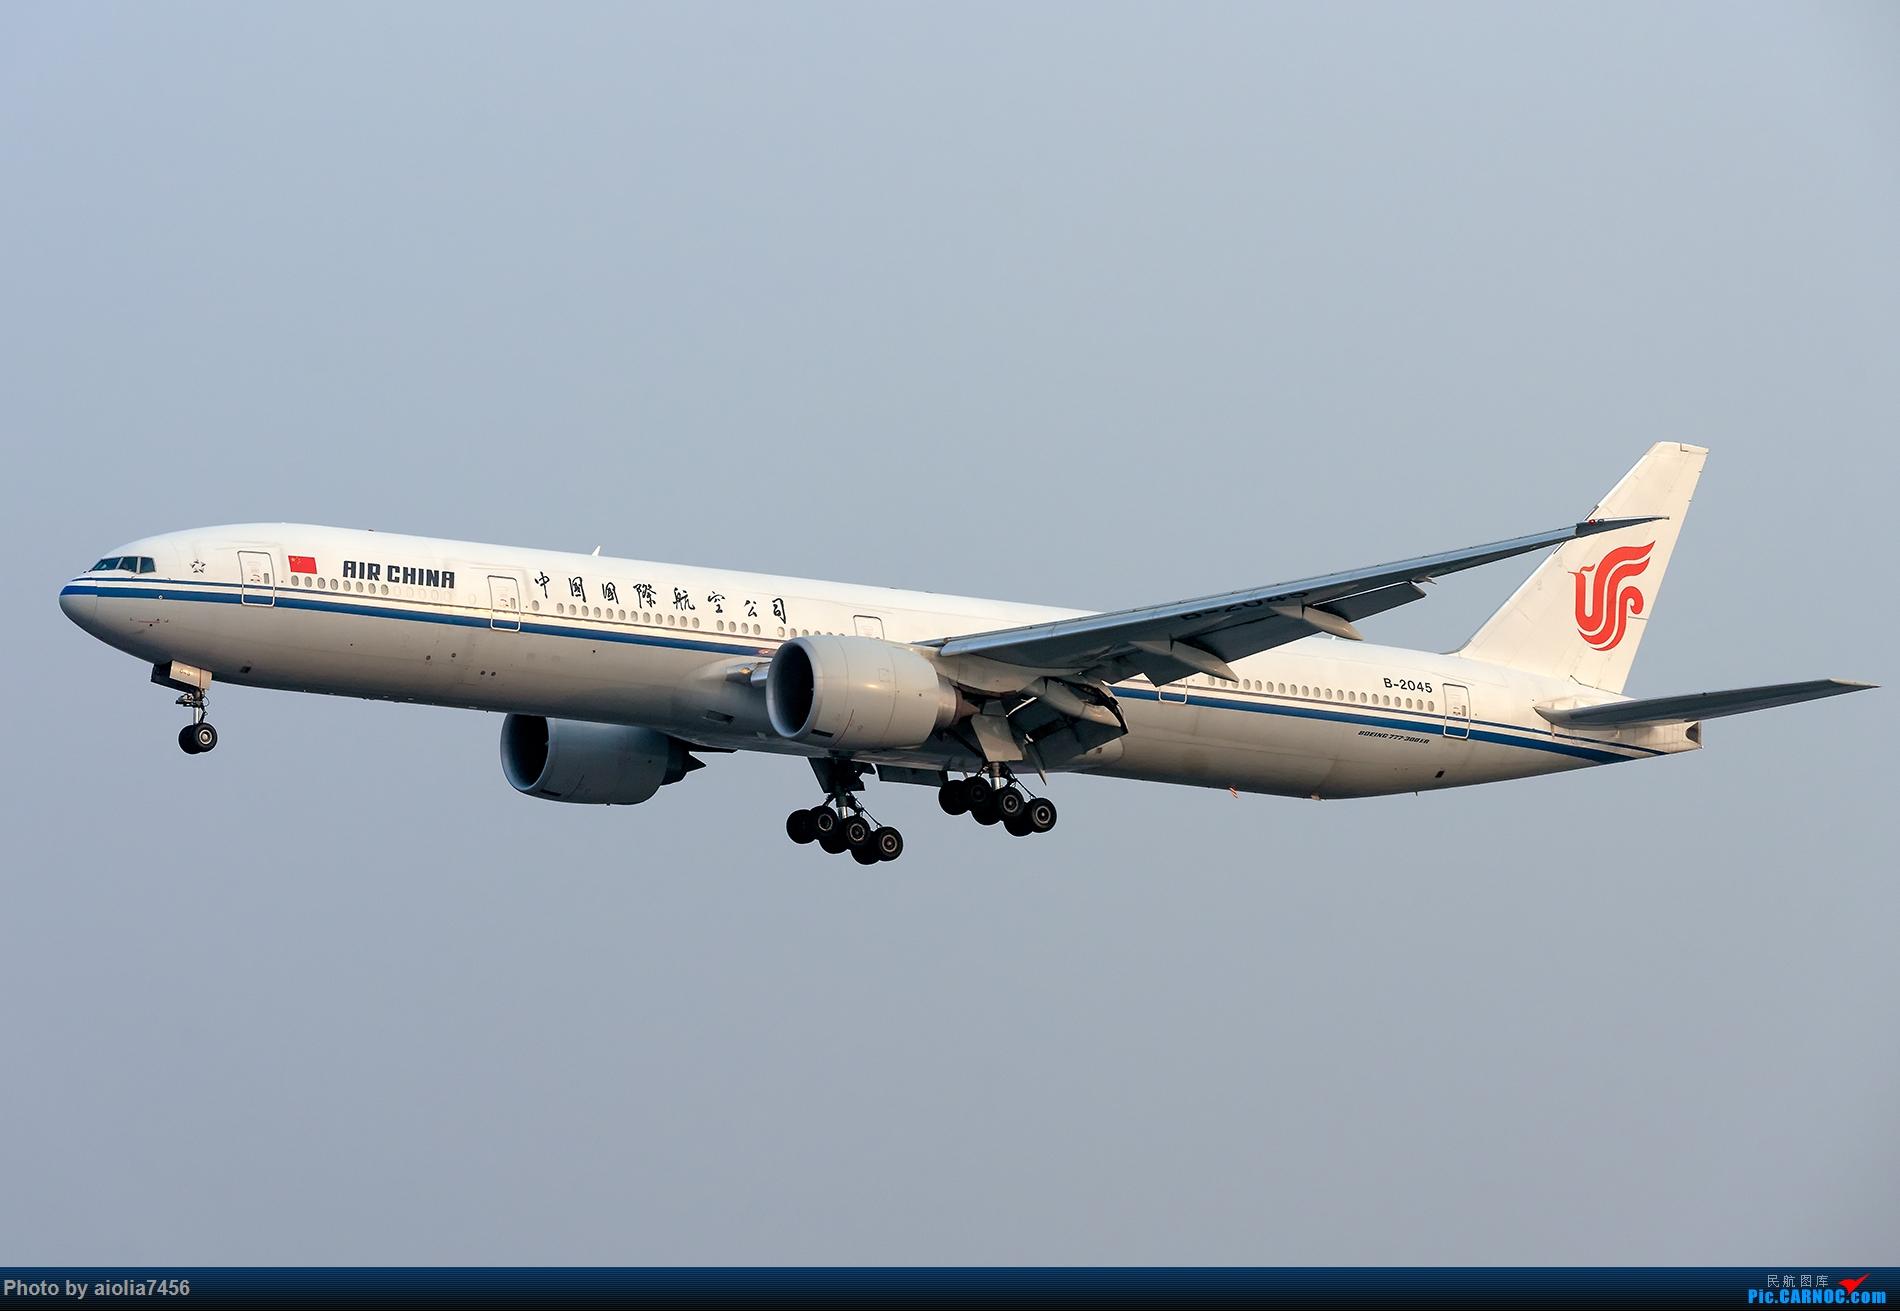 Re:[原创]【霸都打机队】上海培训时顺带虹桥扫货,结果遇到水泥天 BOEING 777-300ER B-2045 中国上海虹桥国际机场